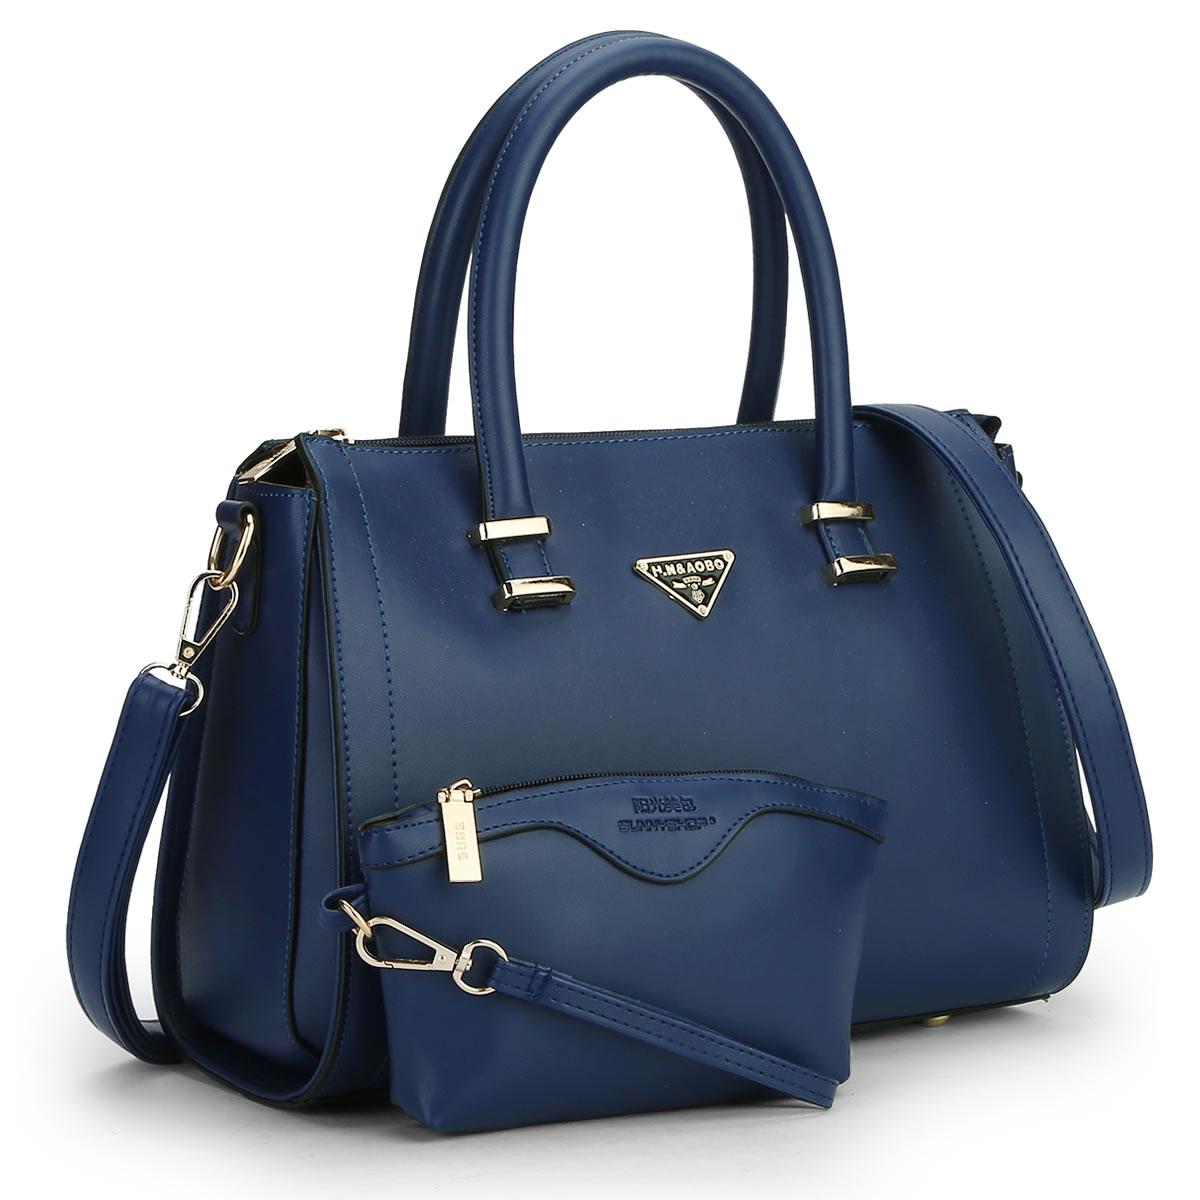 Сумка через плечо Solin famous brand 2015 Remenote designer handbags